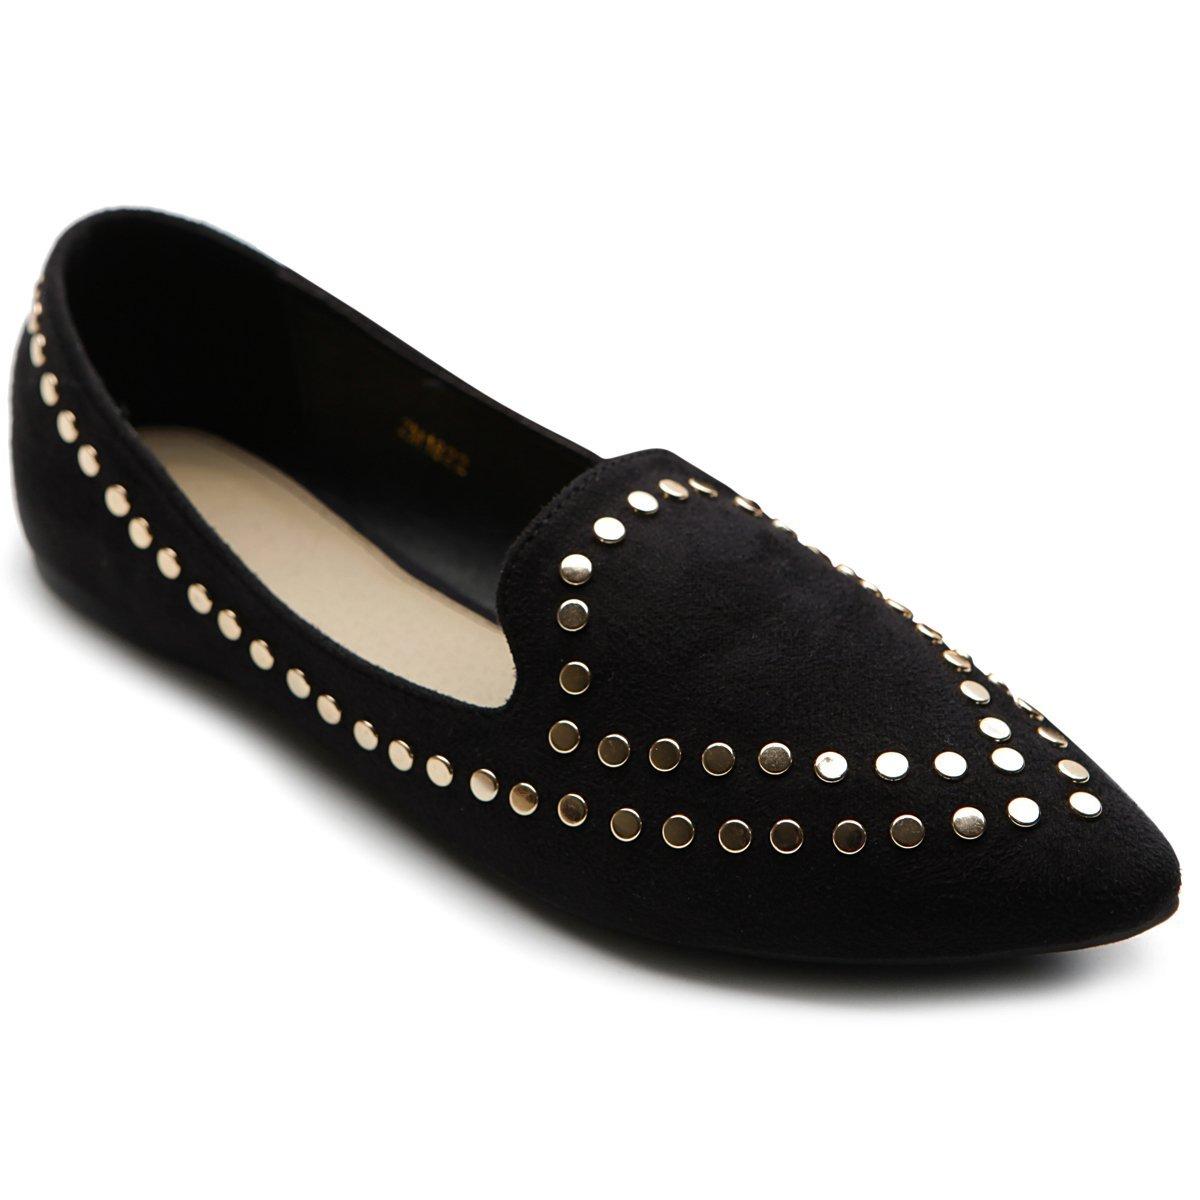 Ollio Women's Ballet Shoe Comfort Faux-Suede Studded Flat(5.5 B(M) US, Burgundy) B00HDOTFHU 6 B(M) US|Black